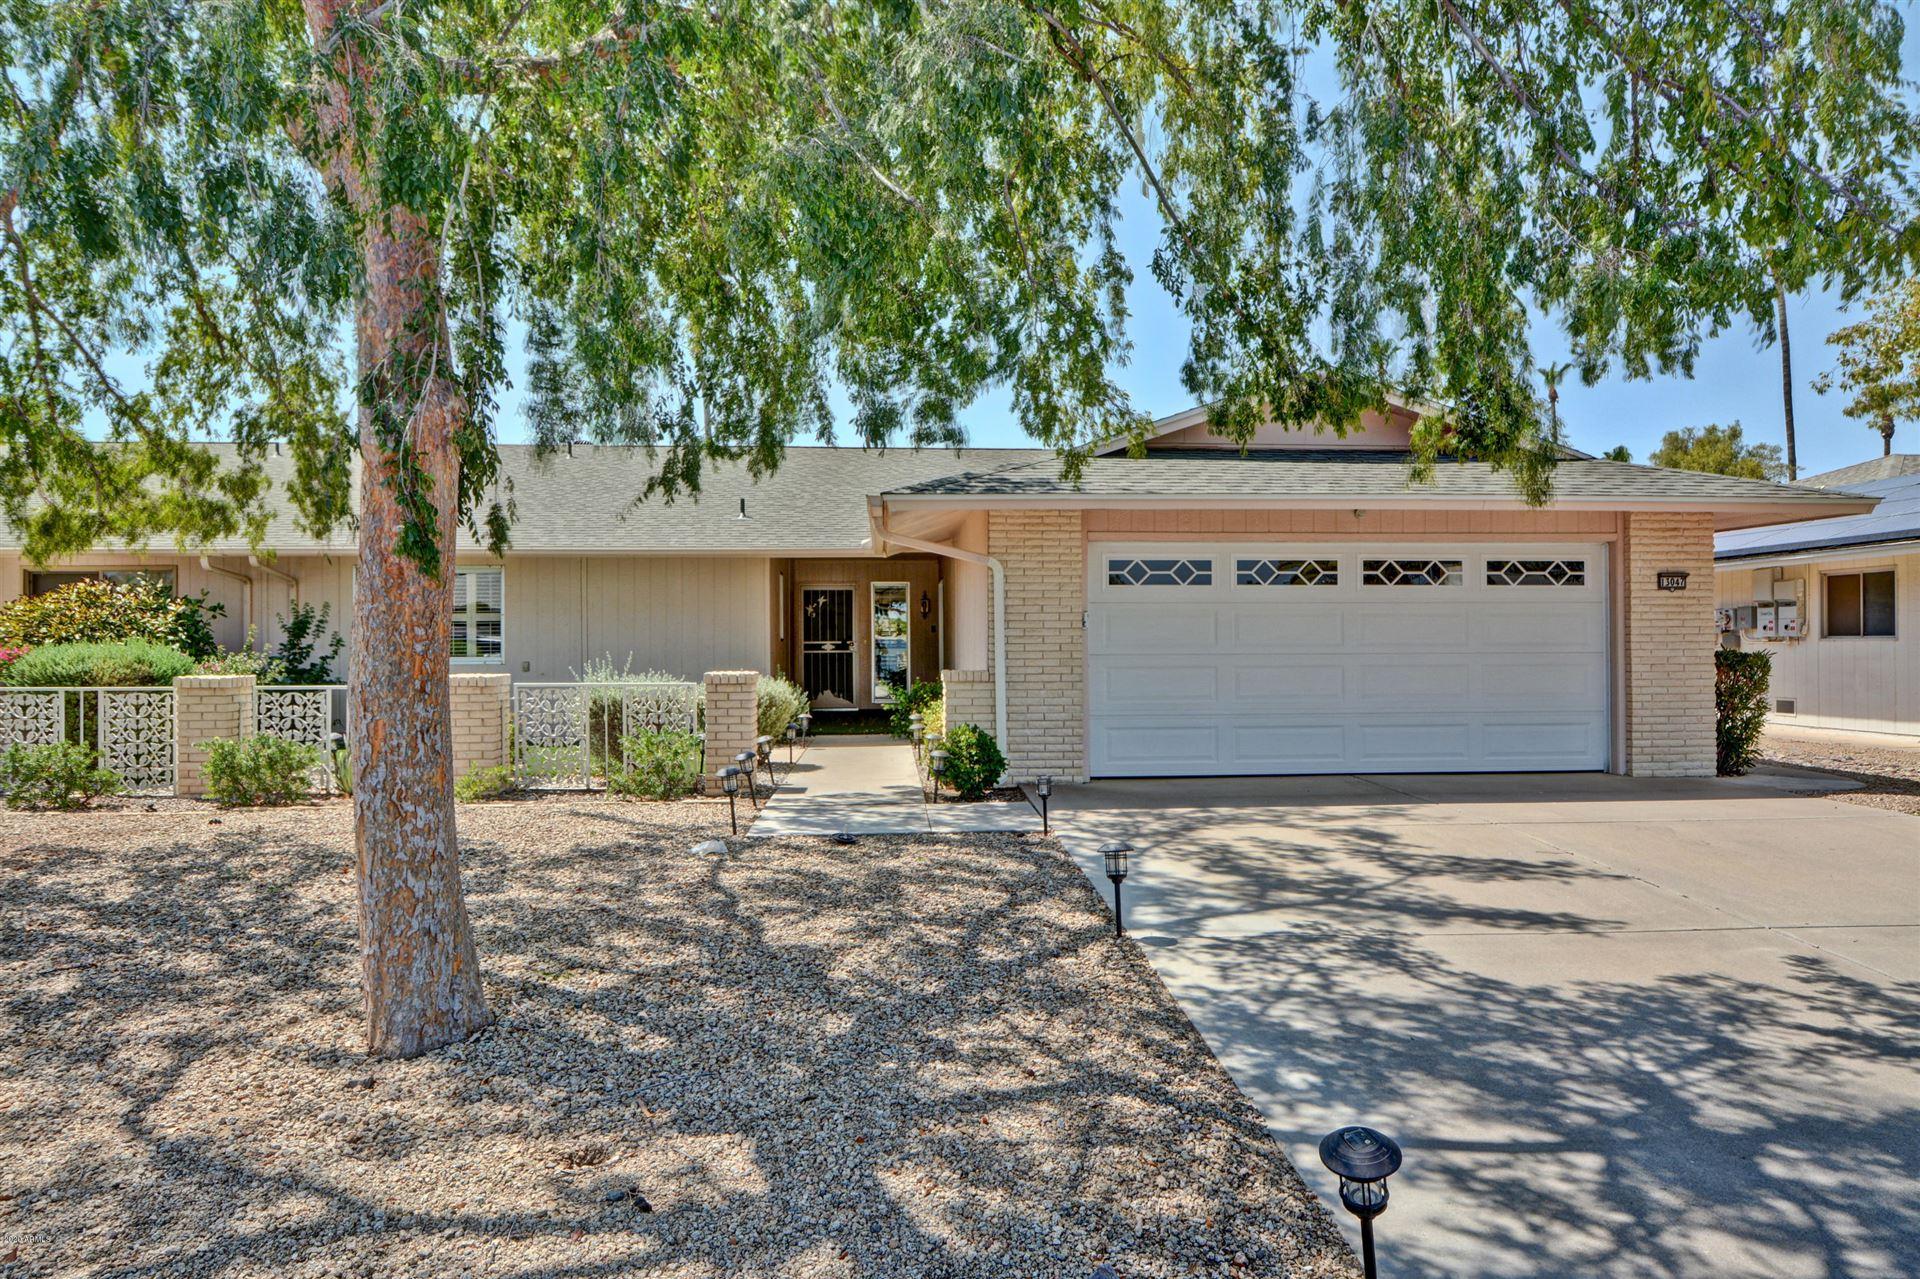 13047 W DESERT GLEN Drive, Sun City West, AZ 85375 - MLS#: 6119018